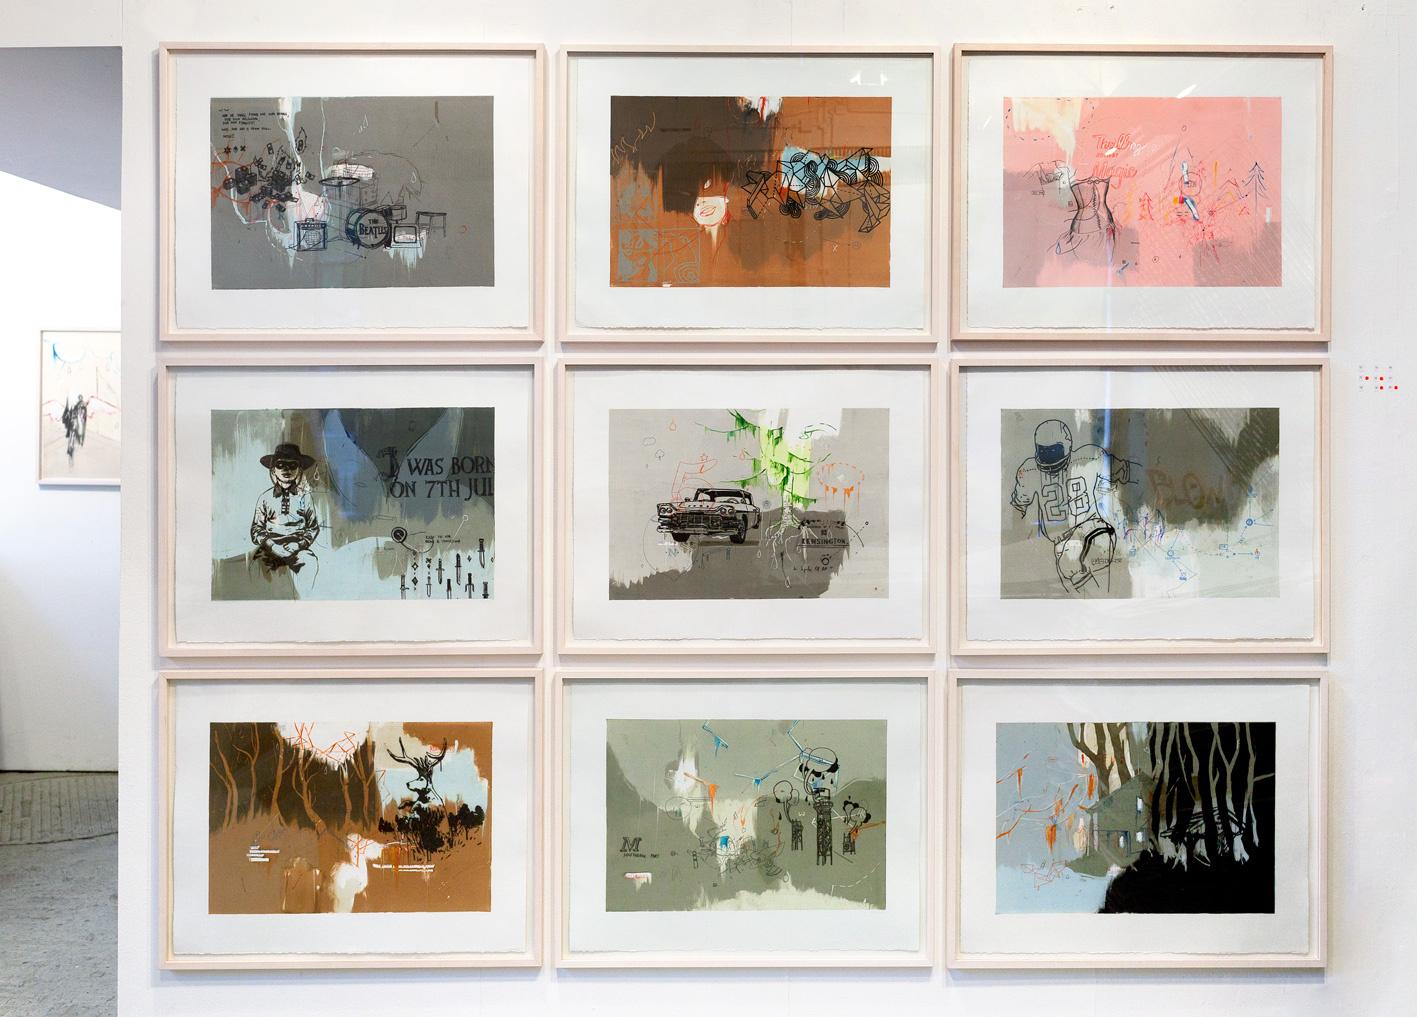 Marcin Kuligowski, Exhibition Front Wall, 2009